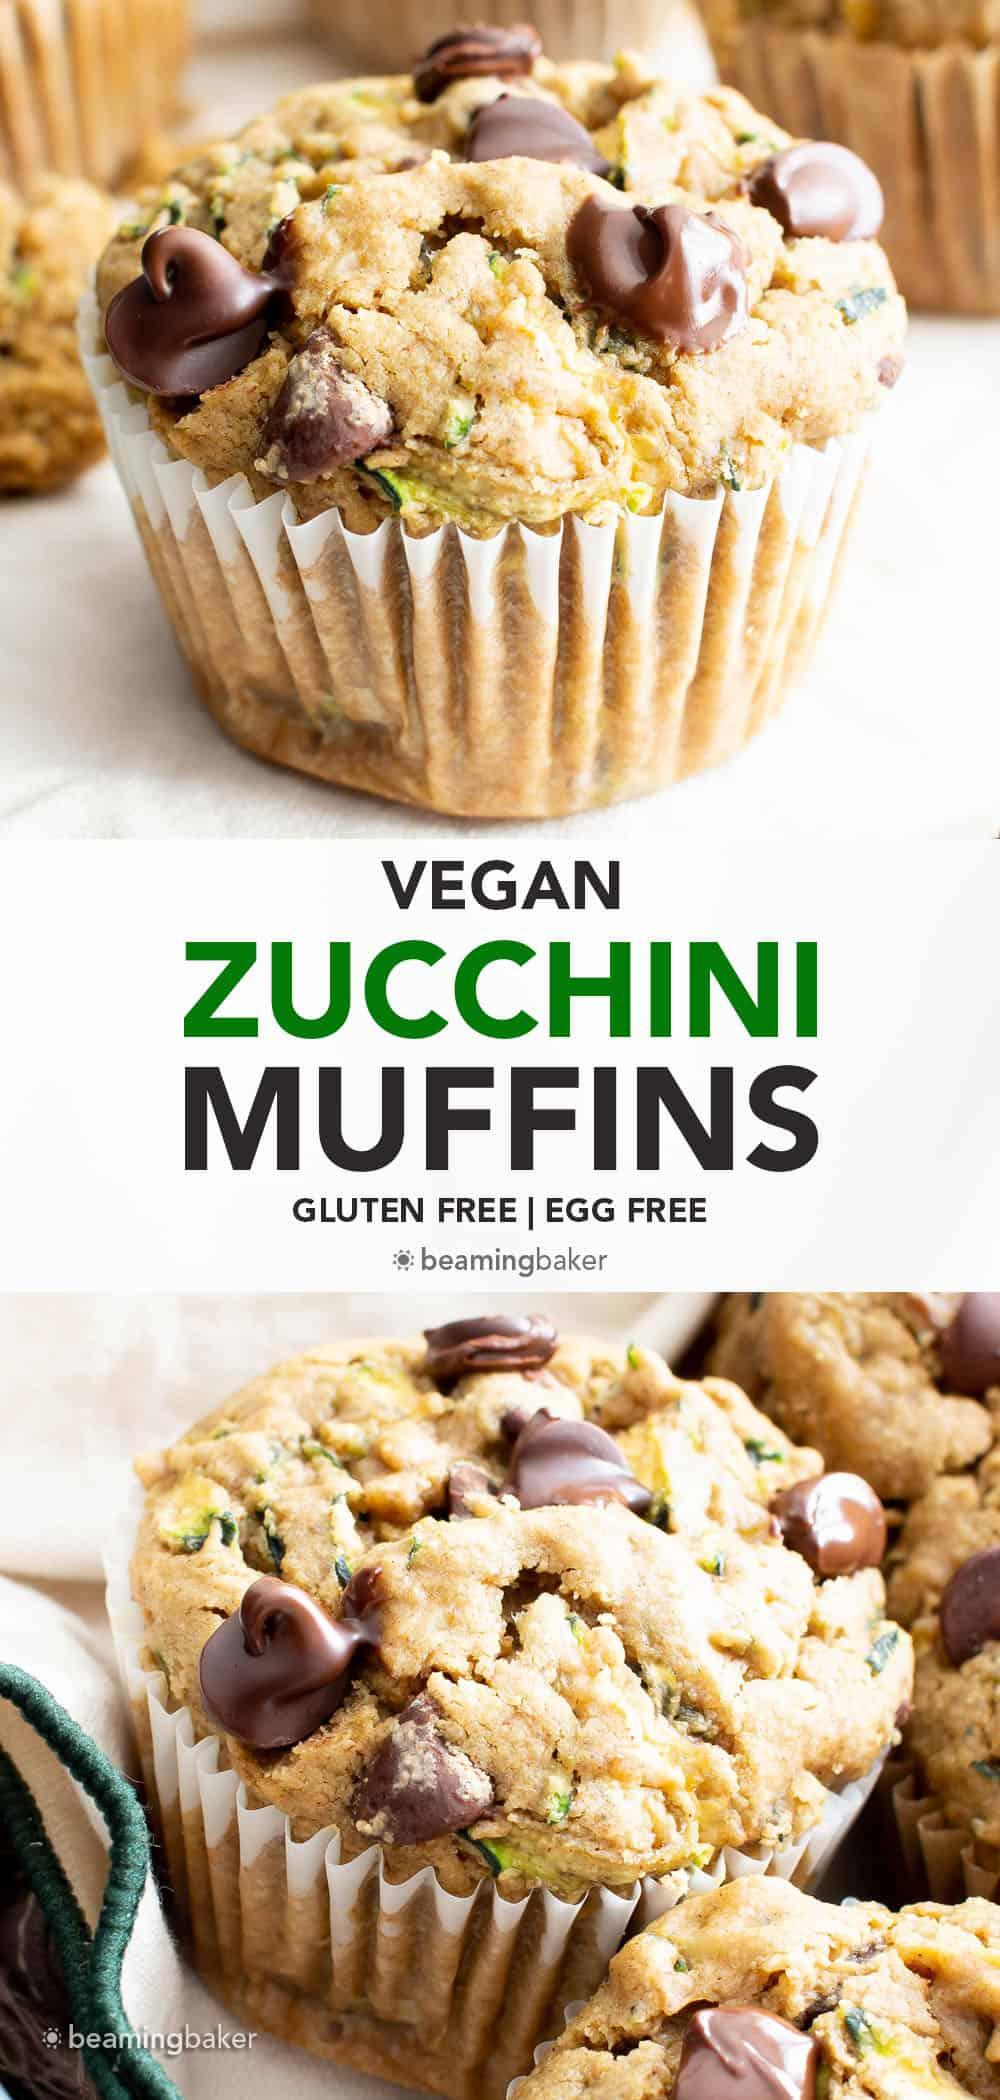 Vegan Zucchini Muffins (Gluten Free): deliciously moist vegan zucchini muffins that are buttery 'n fluffy! The best gluten free zucchini muffins—egg-free & delicious. #Vegan #GlutenFree #Zucchini #Muffins | Recipe at BeamingBaker.com